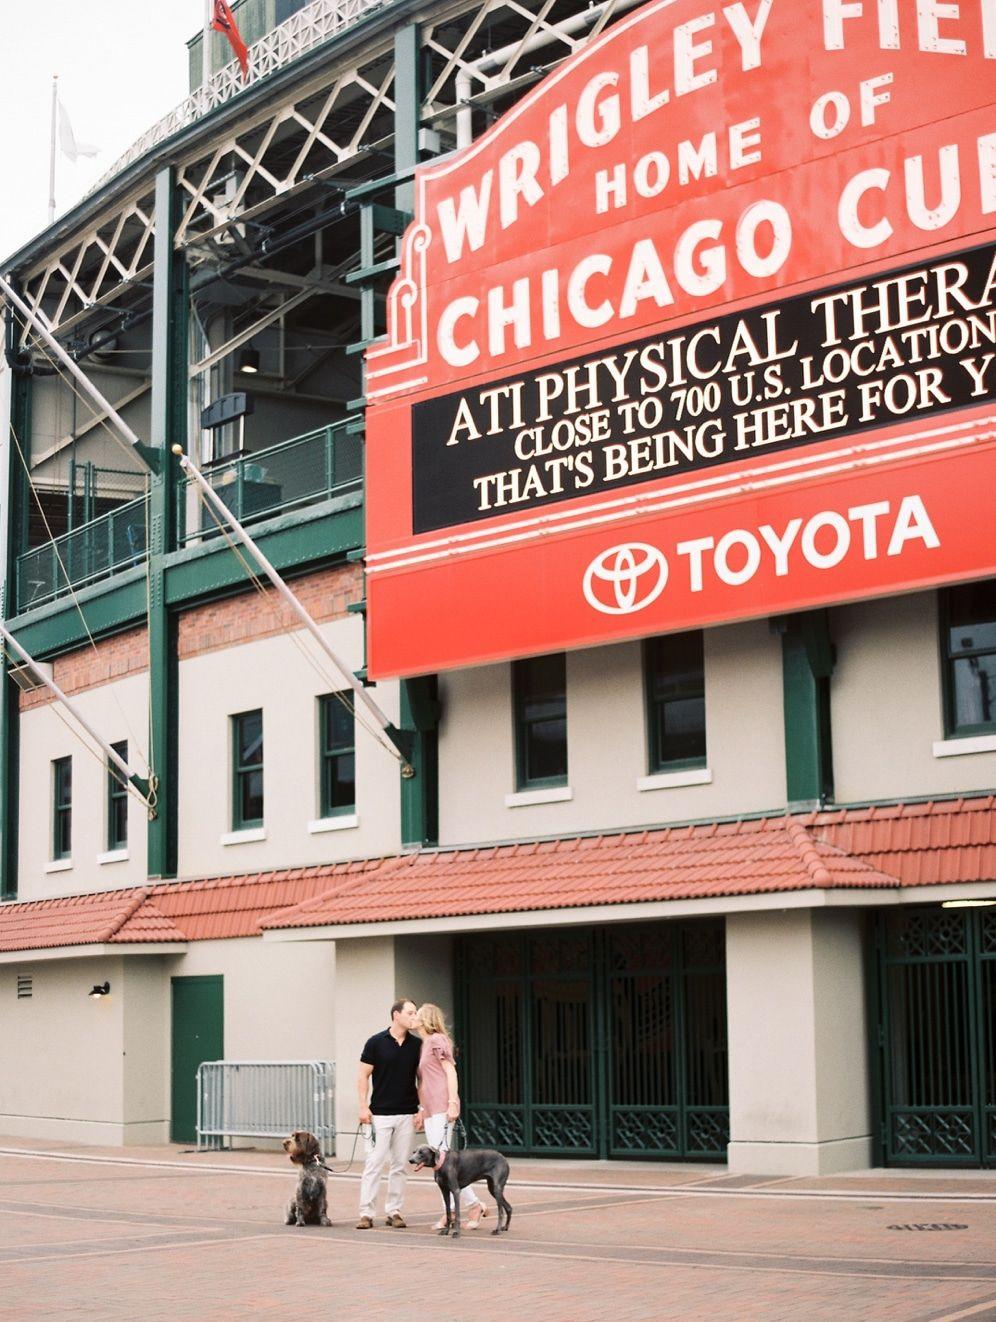 Northside Chicago Engagement Photos Kristin La Voie Photography Chicago Austin Fine Art Wedding Photographer Chicago Engagement Photos Chicago Engagement Engagement Photos